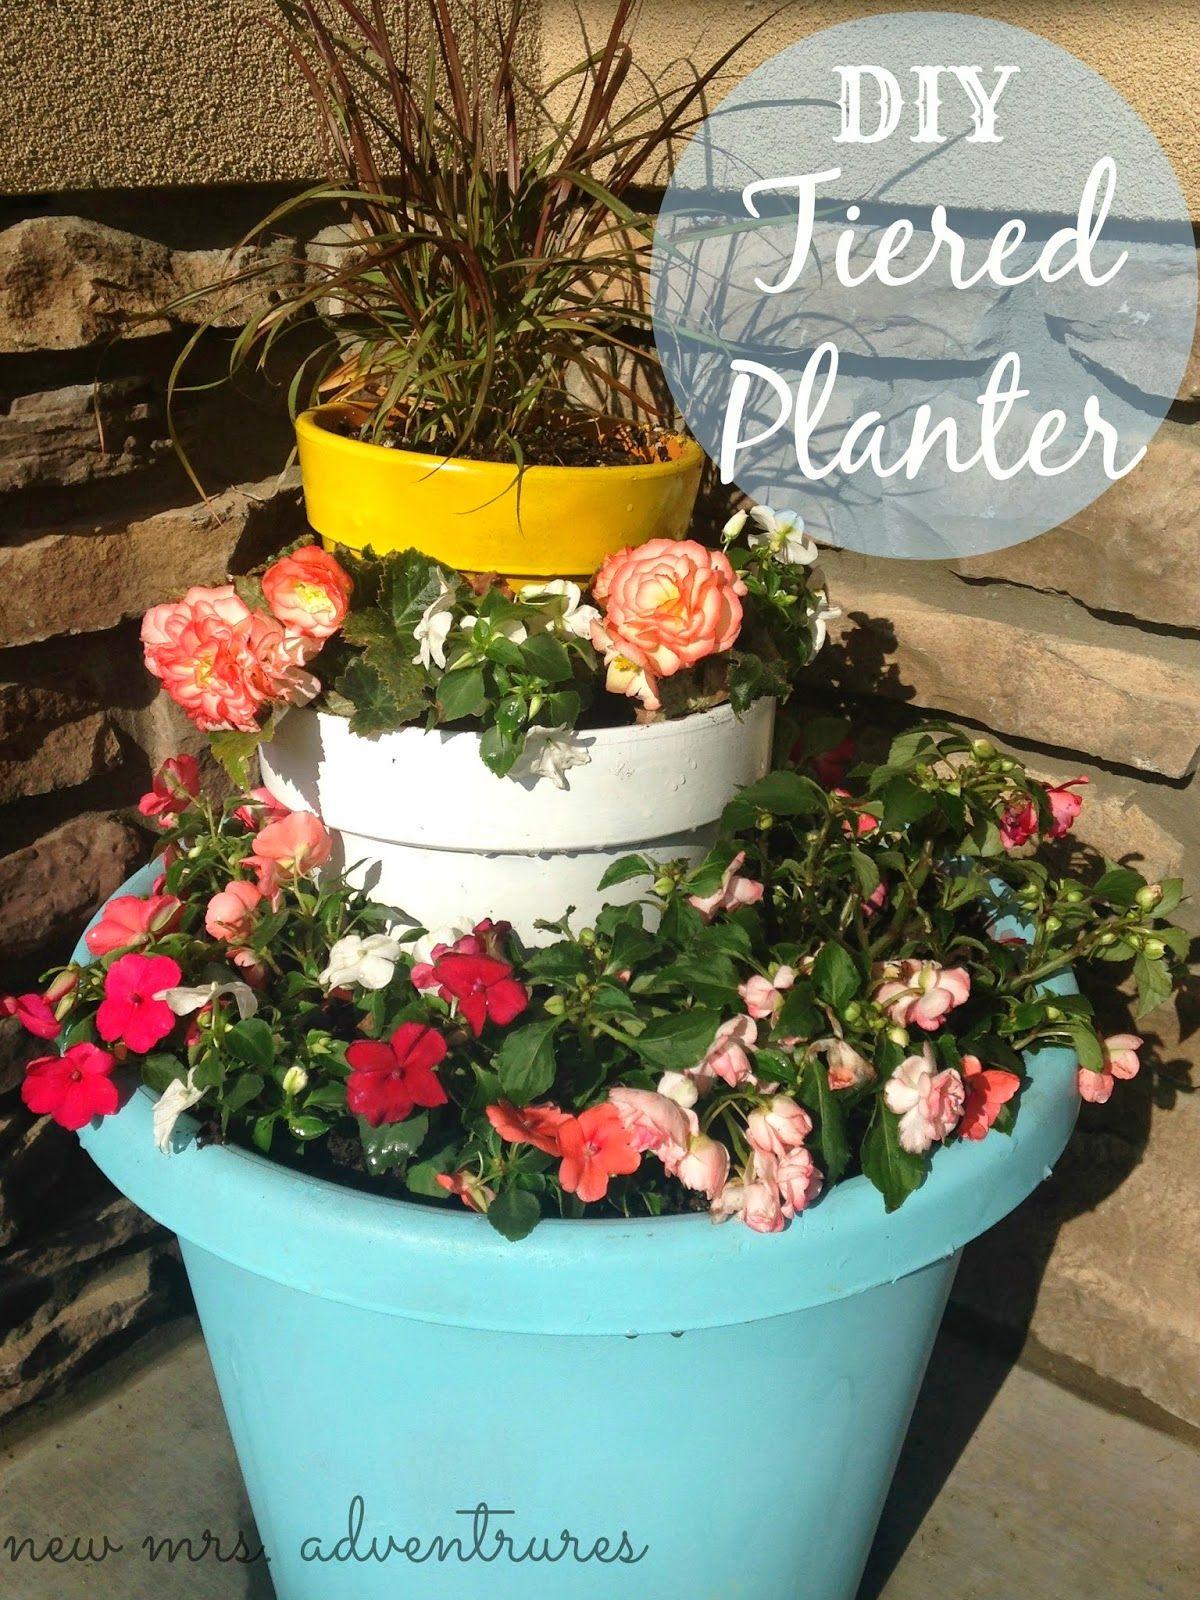 new mrs. adventures DIY Spring Tiered Flower Pots & new mrs. adventures: DIY Spring Tiered Flower Pots   My Pots ...